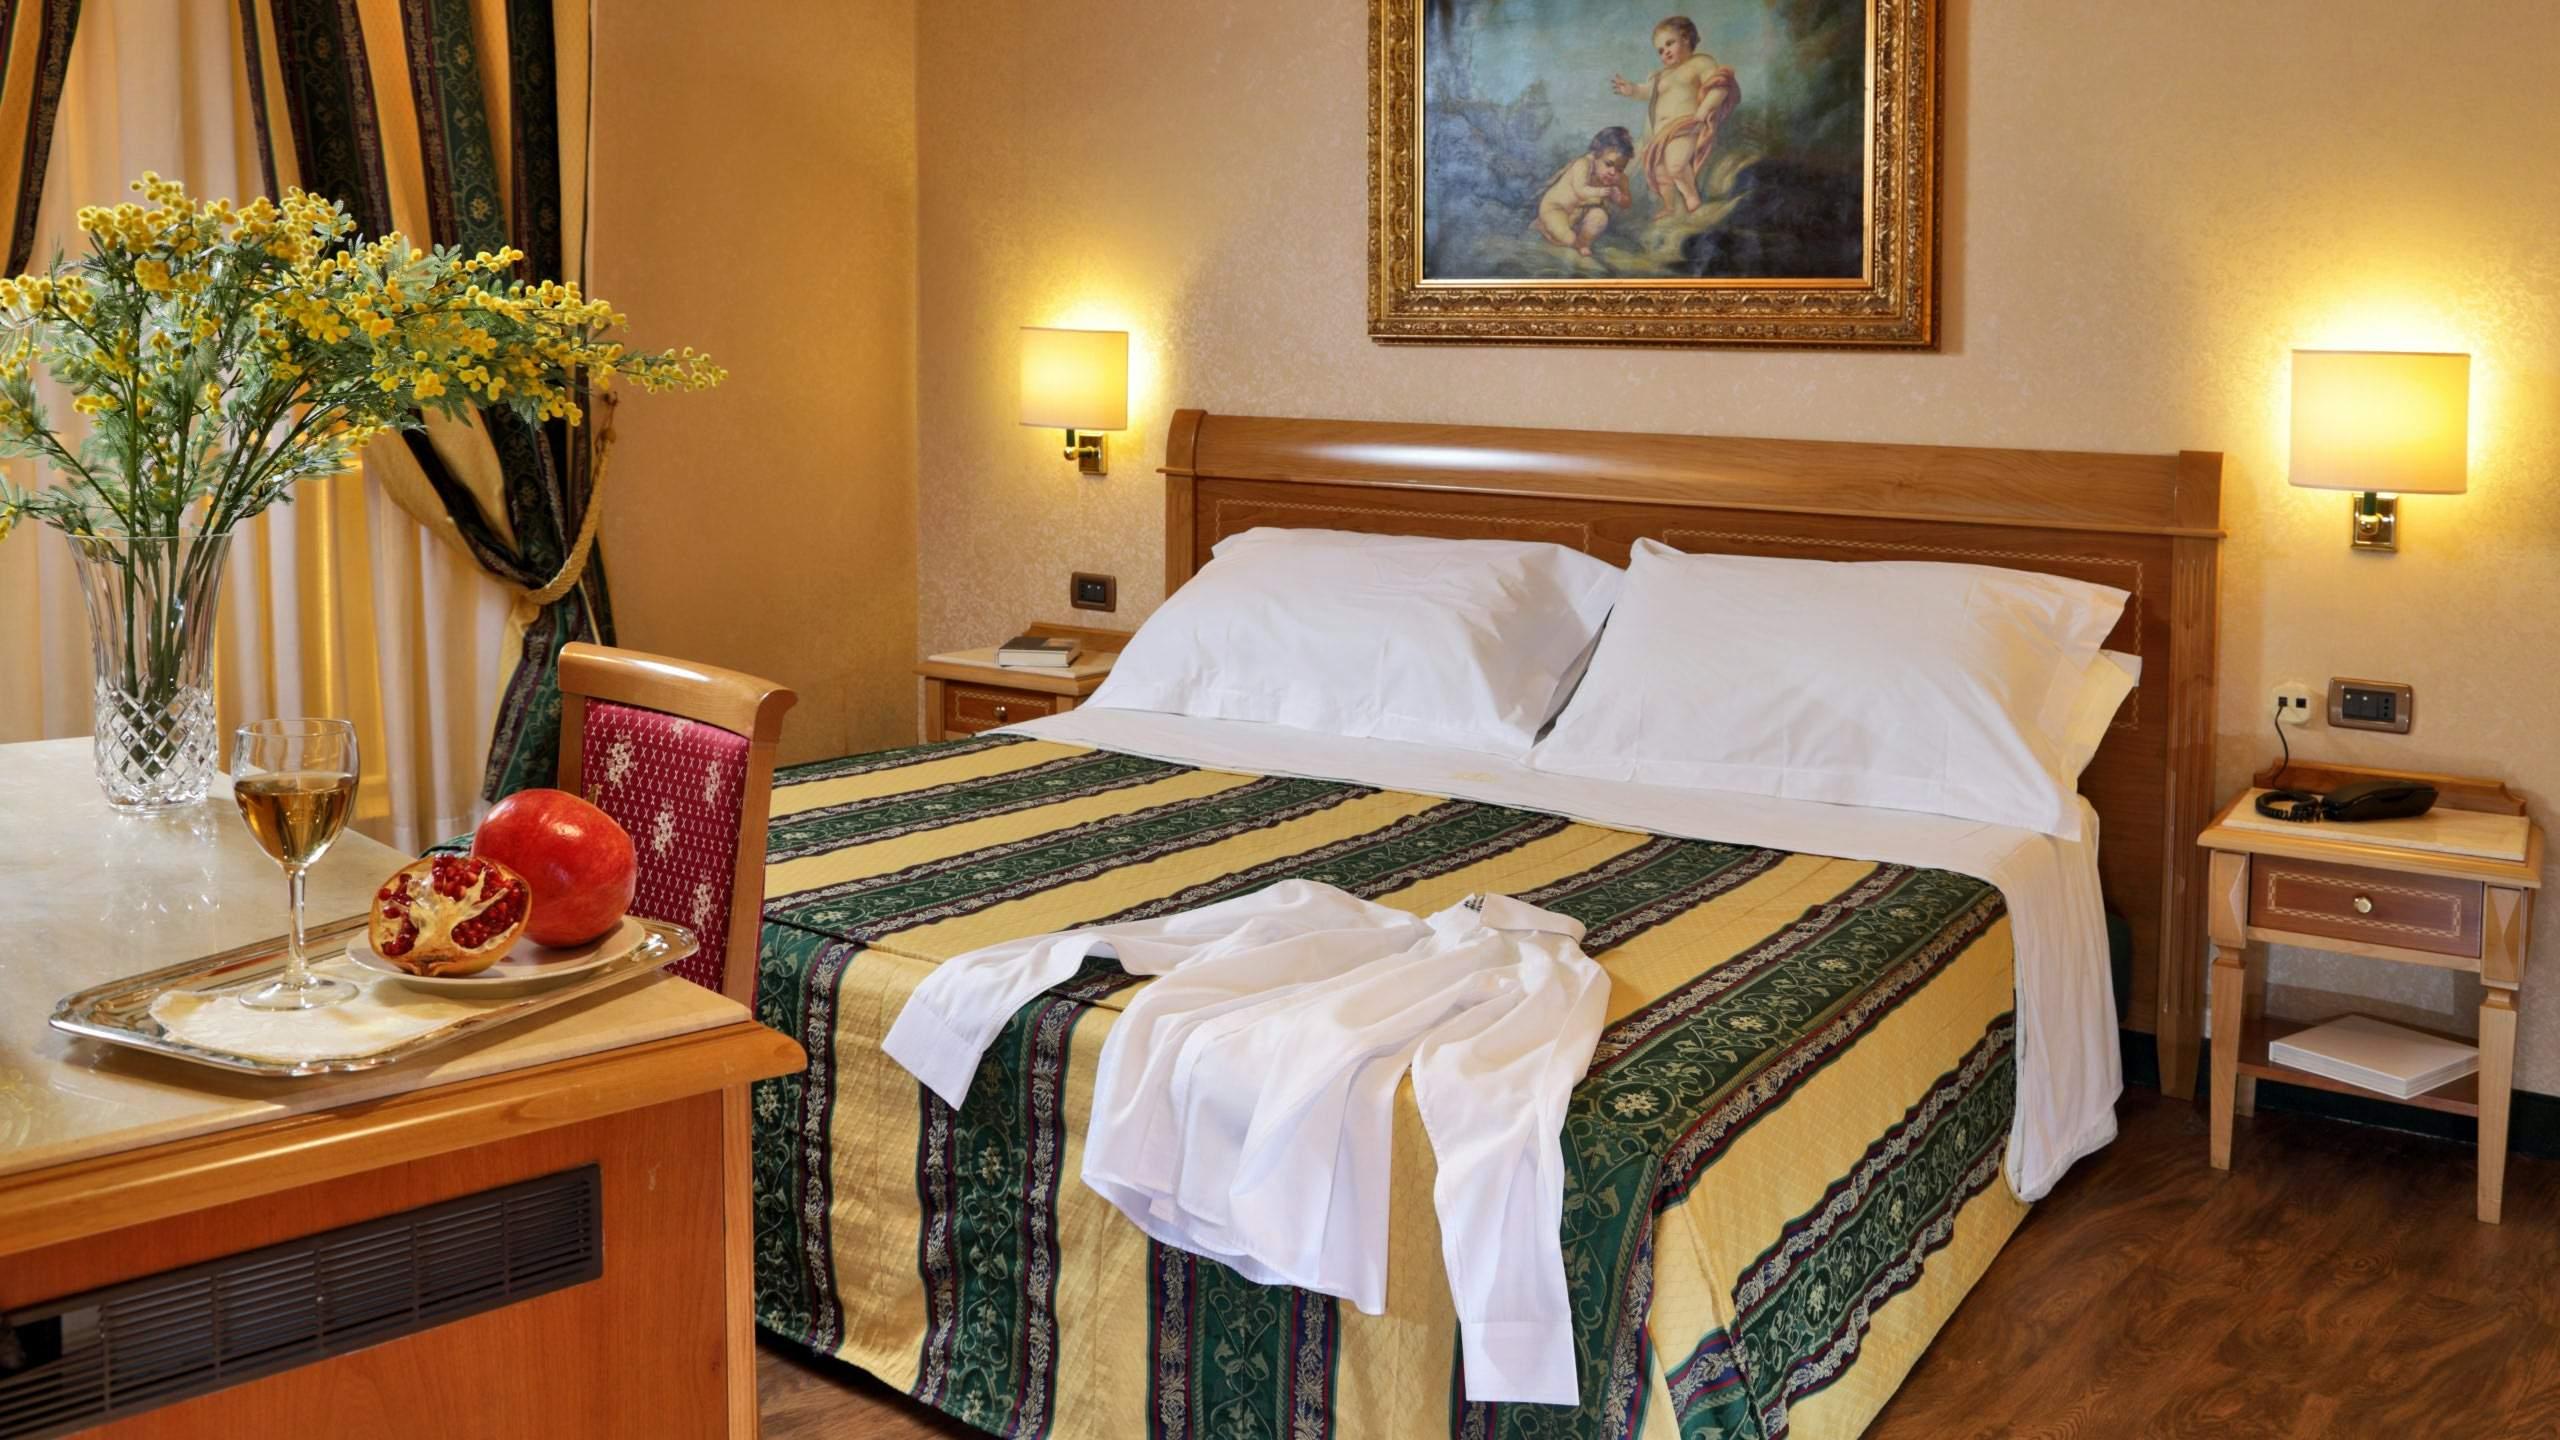 Hotel-Colonna-Frascati-camera-12